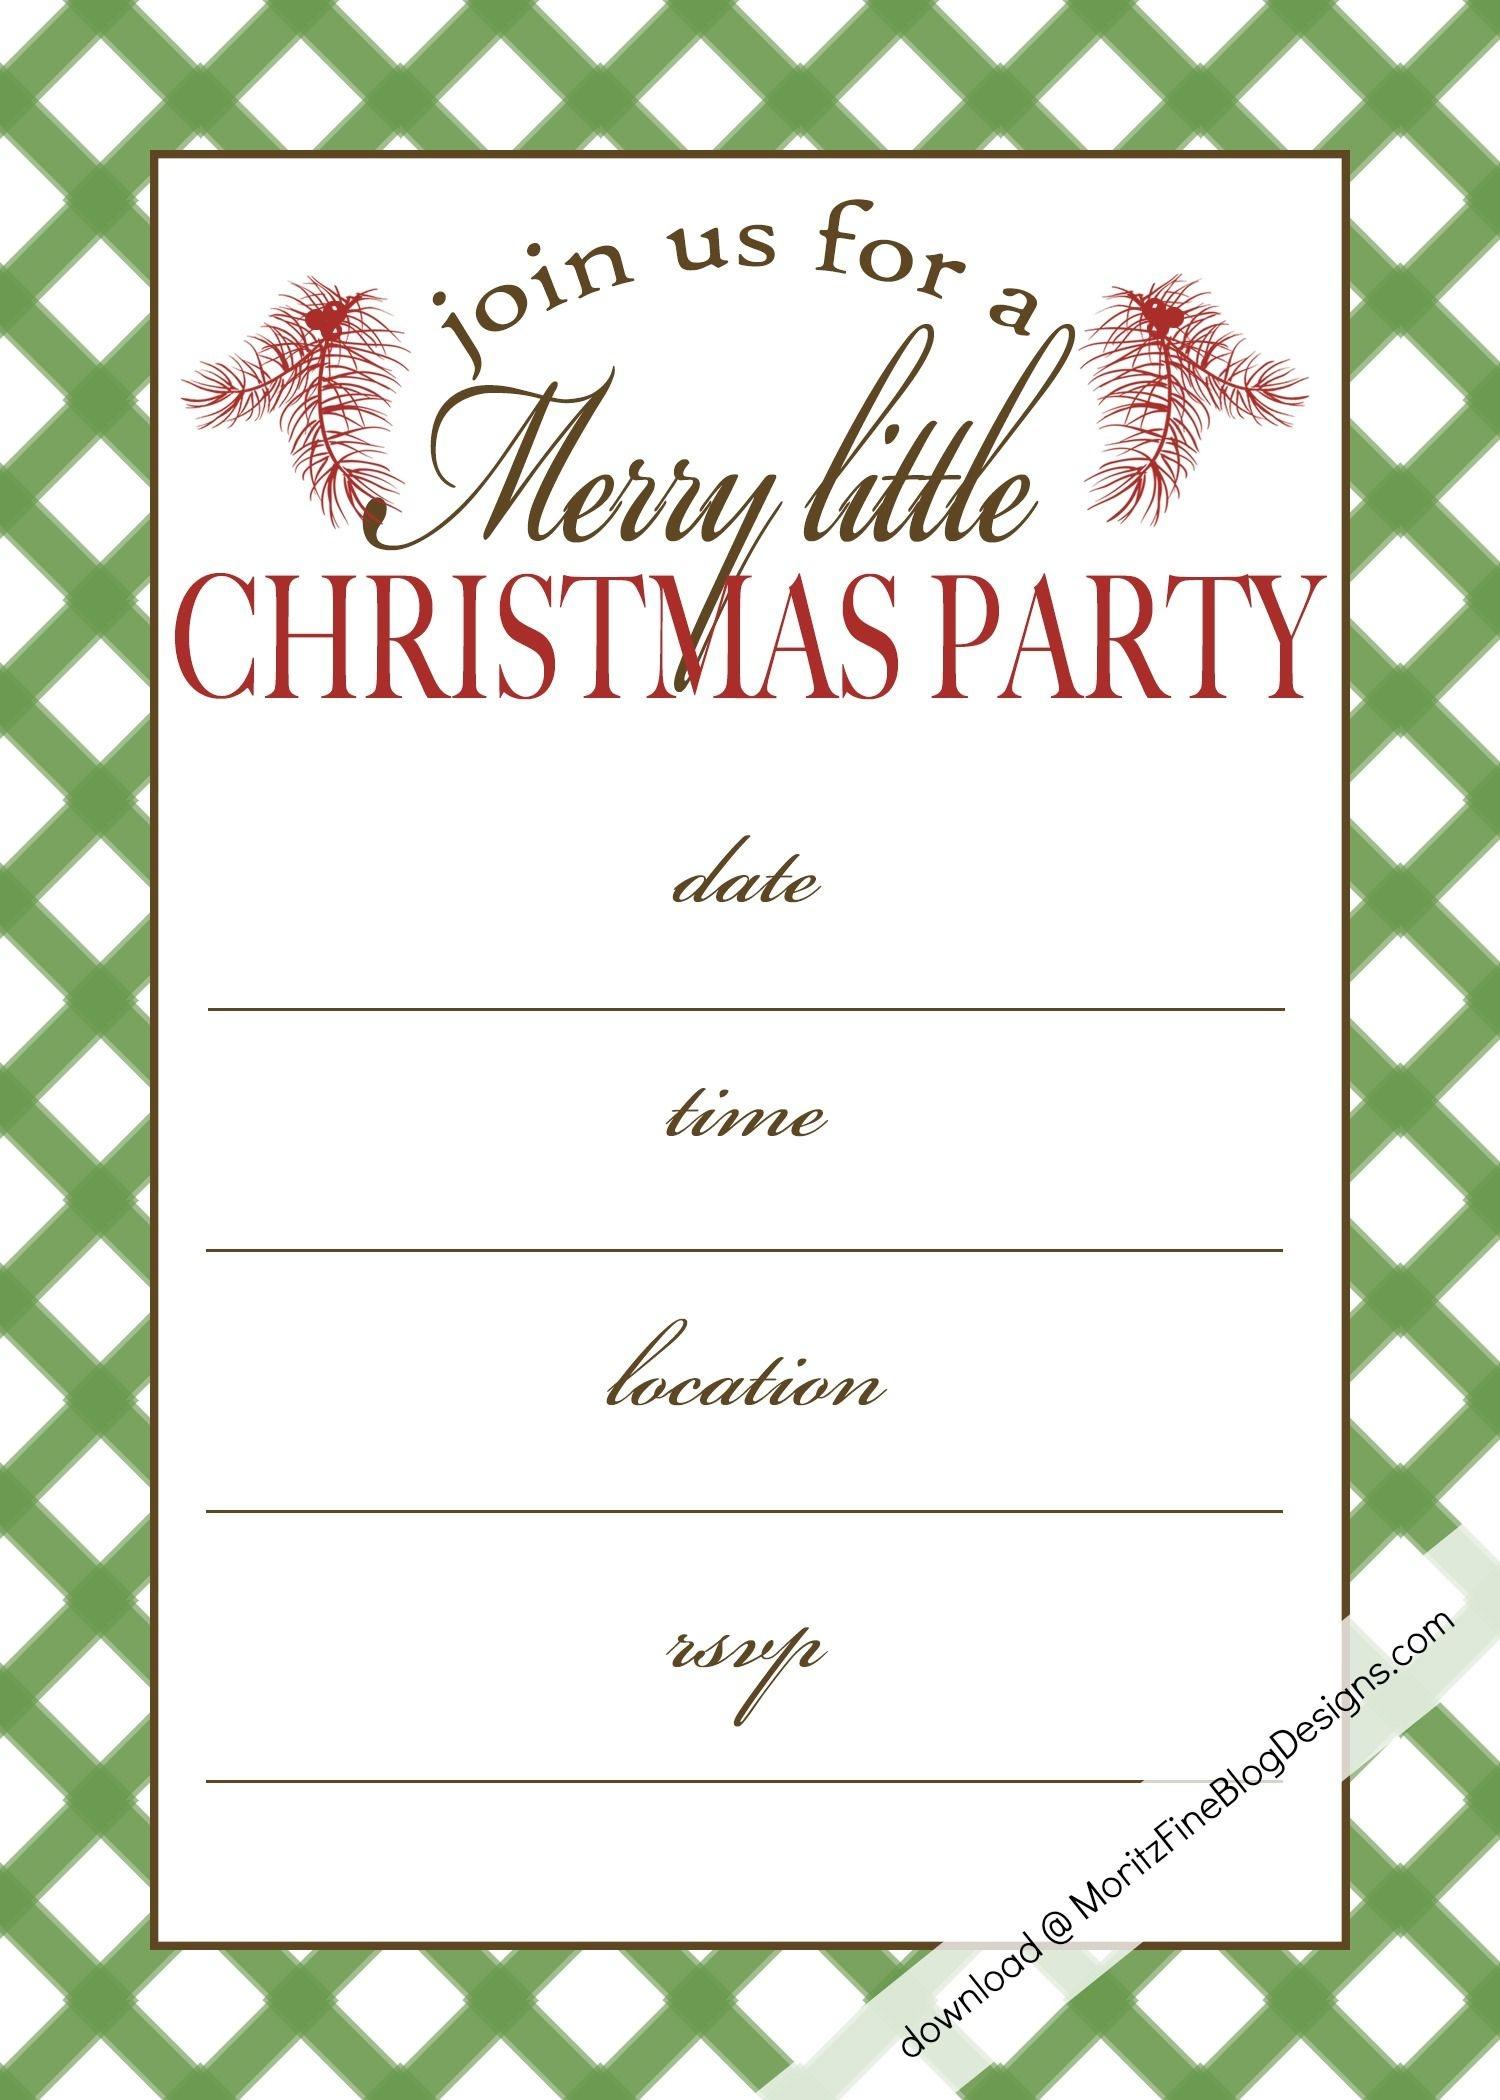 Free Printable Christmas Party Invitation | Christmas:print - Holiday Invitations Free Printable